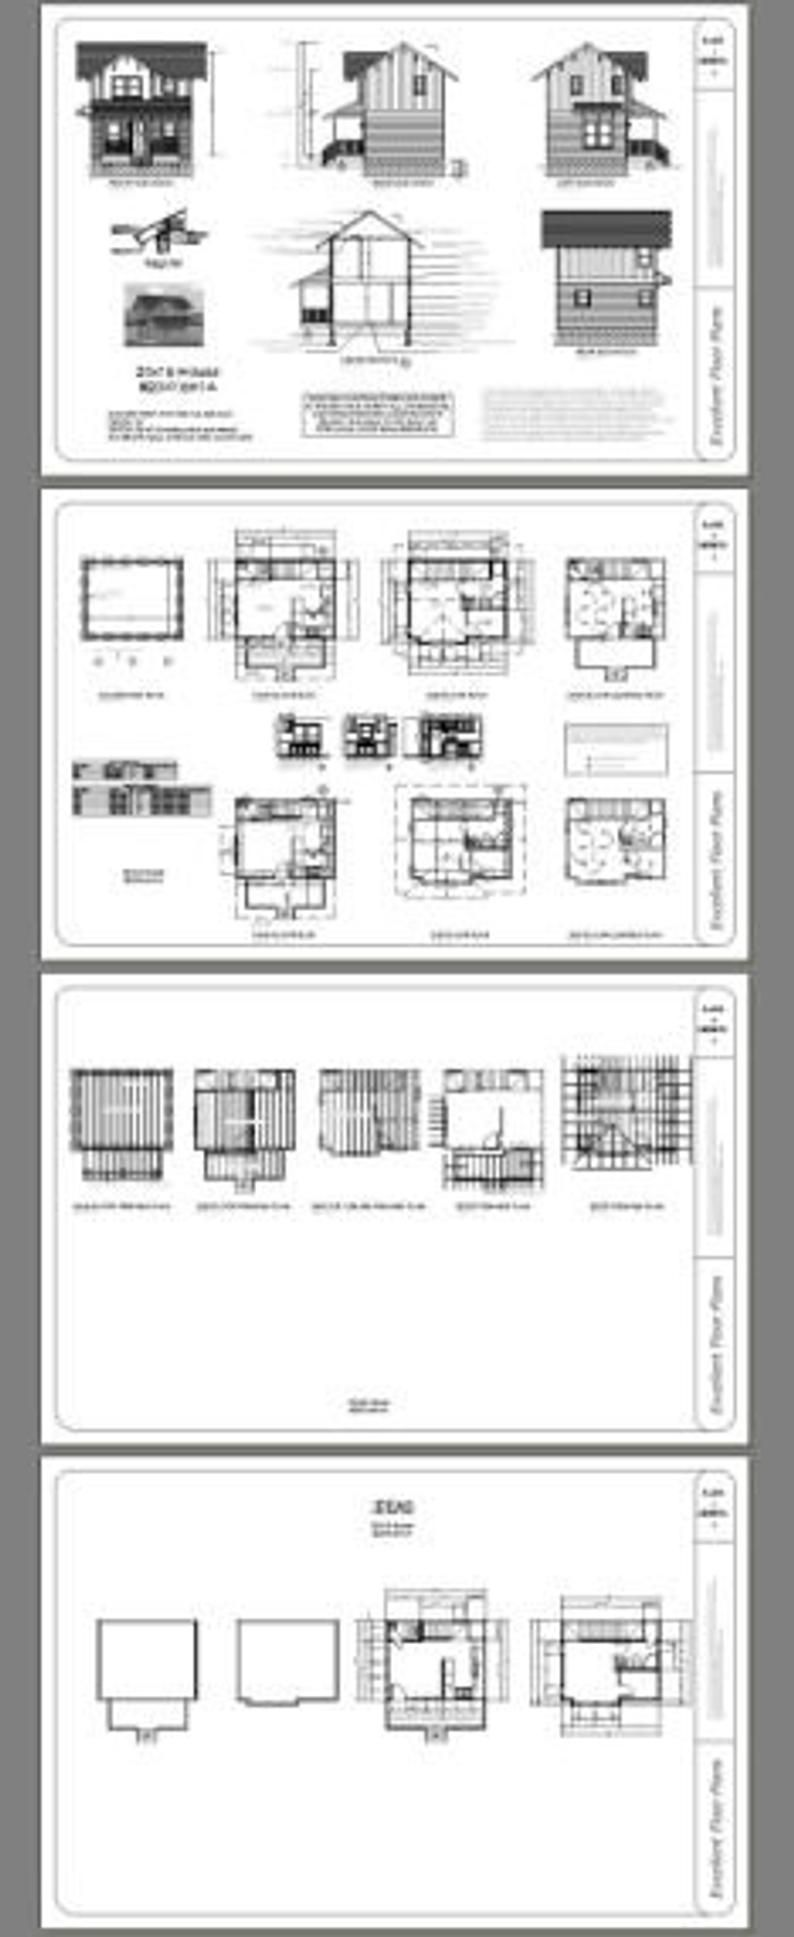 20x16 House 1Bedroom 1.5Bath 547 sq ft PDF